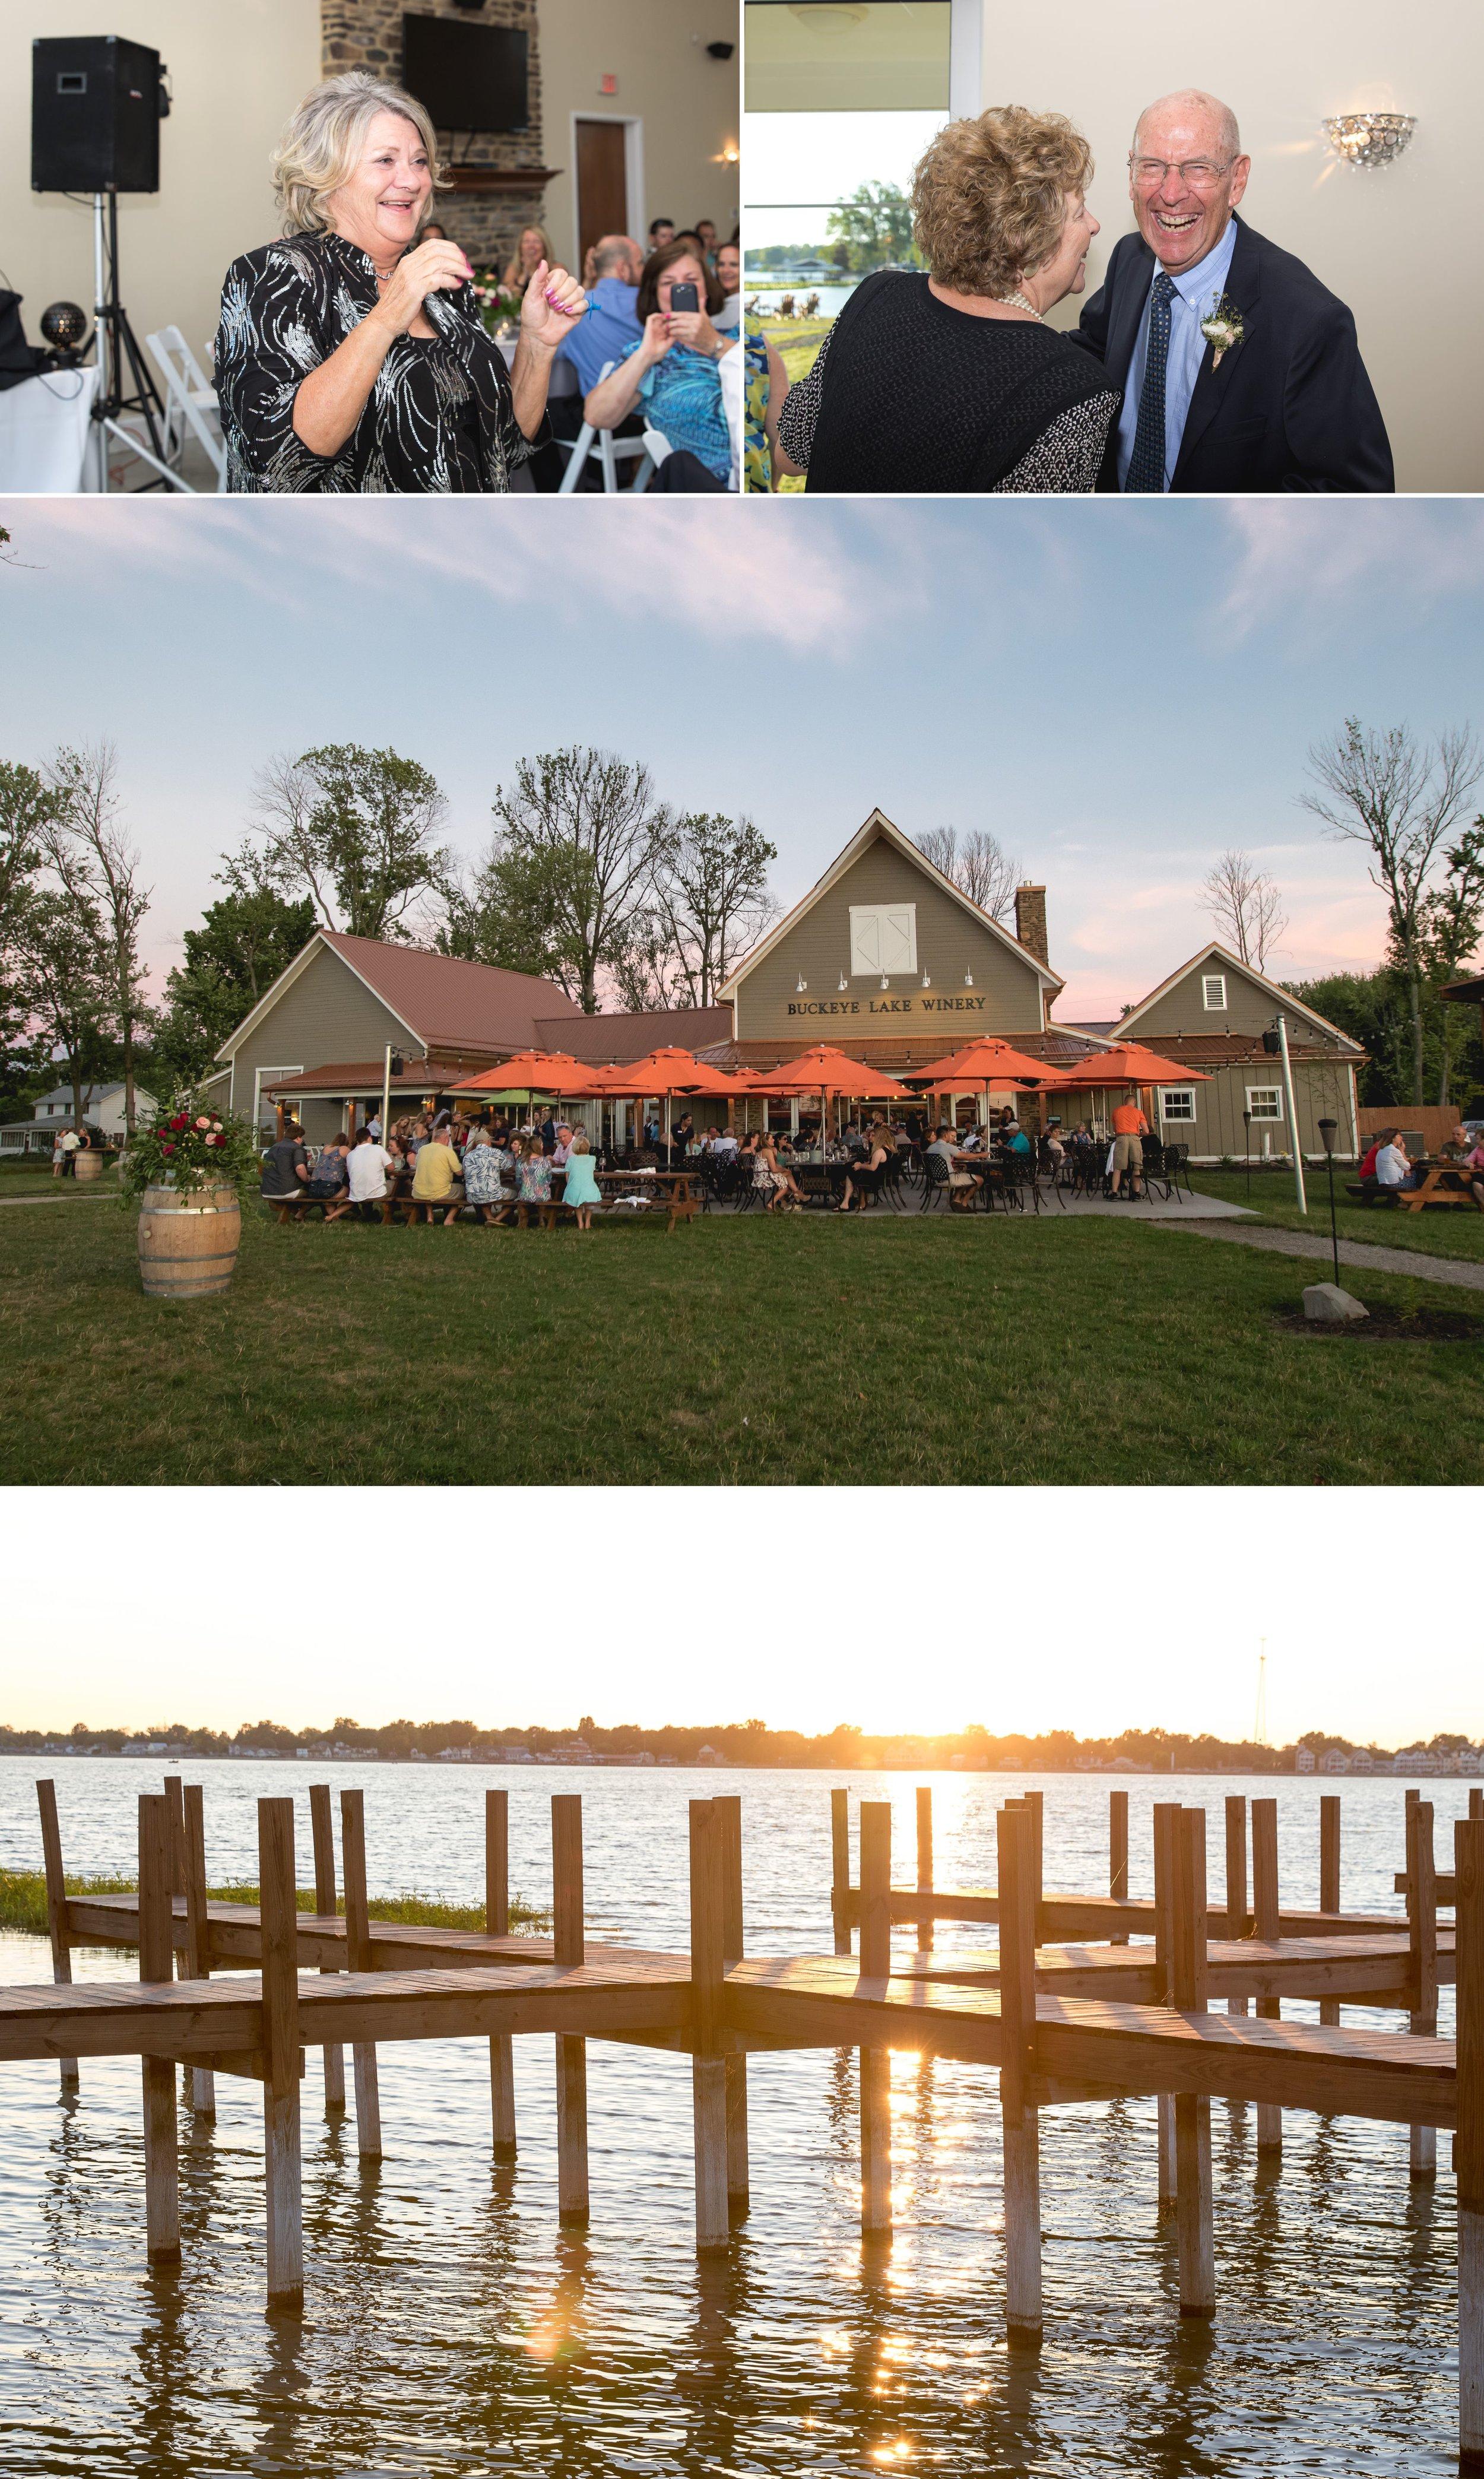 019-Buckeye-lake-winery-wedding-venue-columbus-ohio-wedding-muschlitz-photography-reception-04.JPG